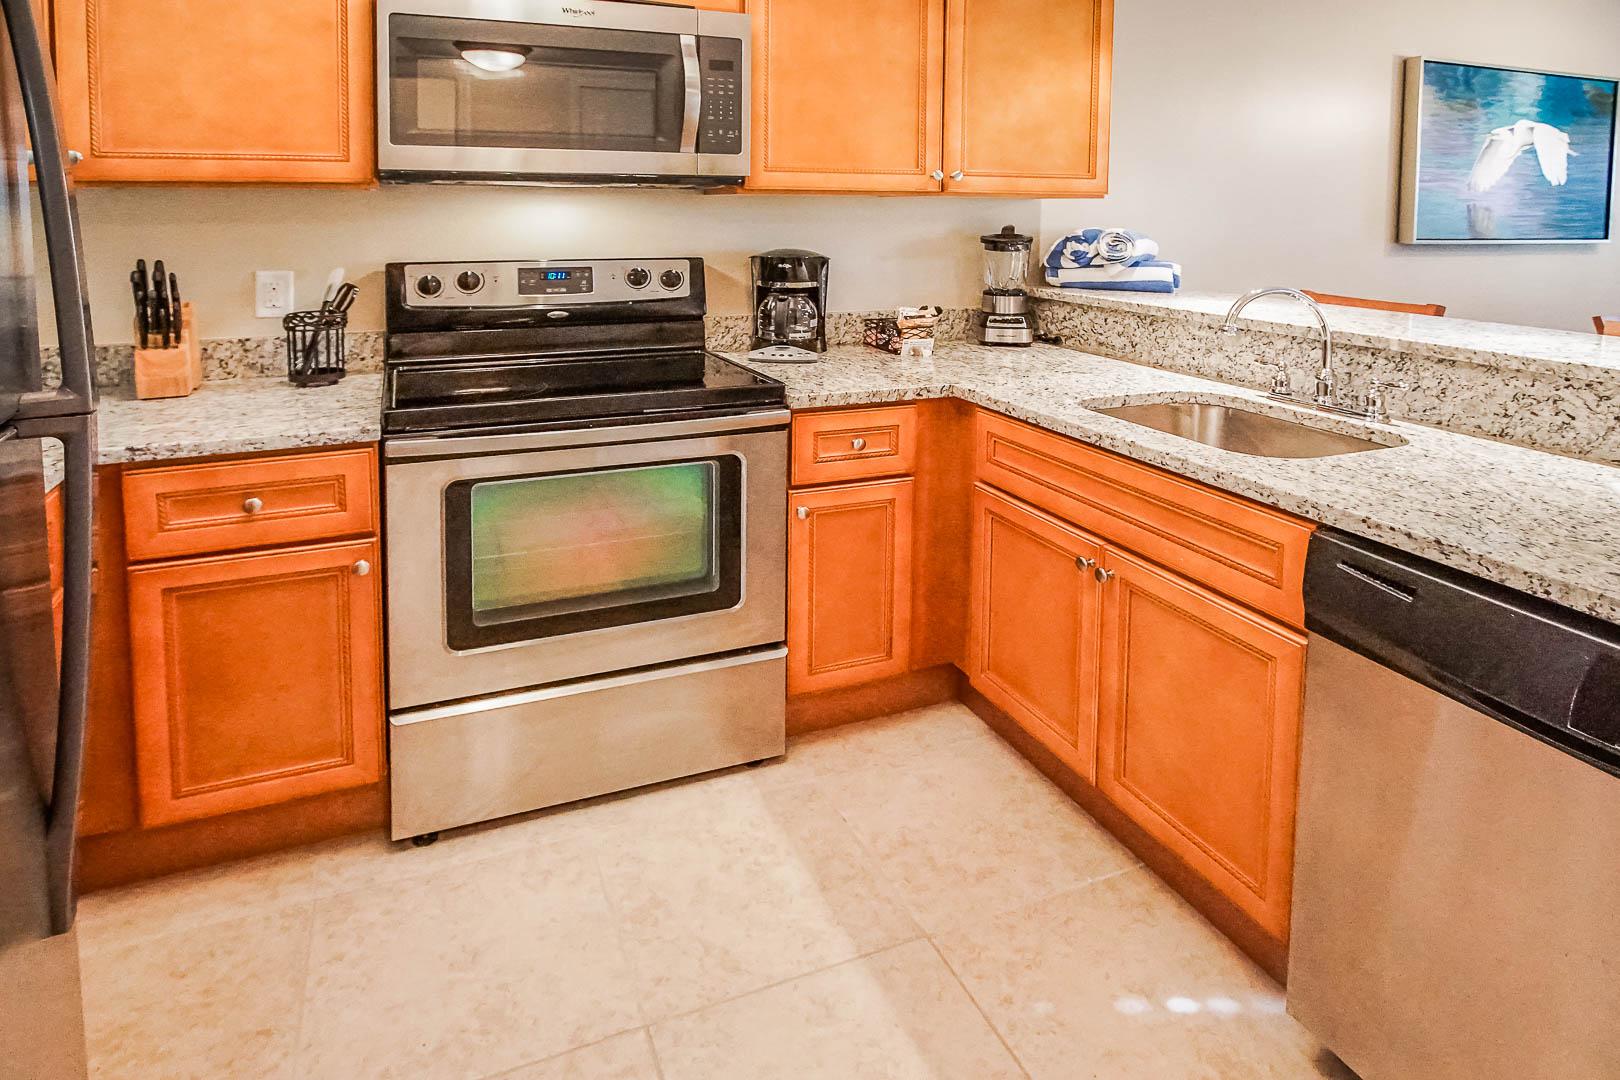 A spacious kitchen area at VRI's Fantasy World Resort in Florida.